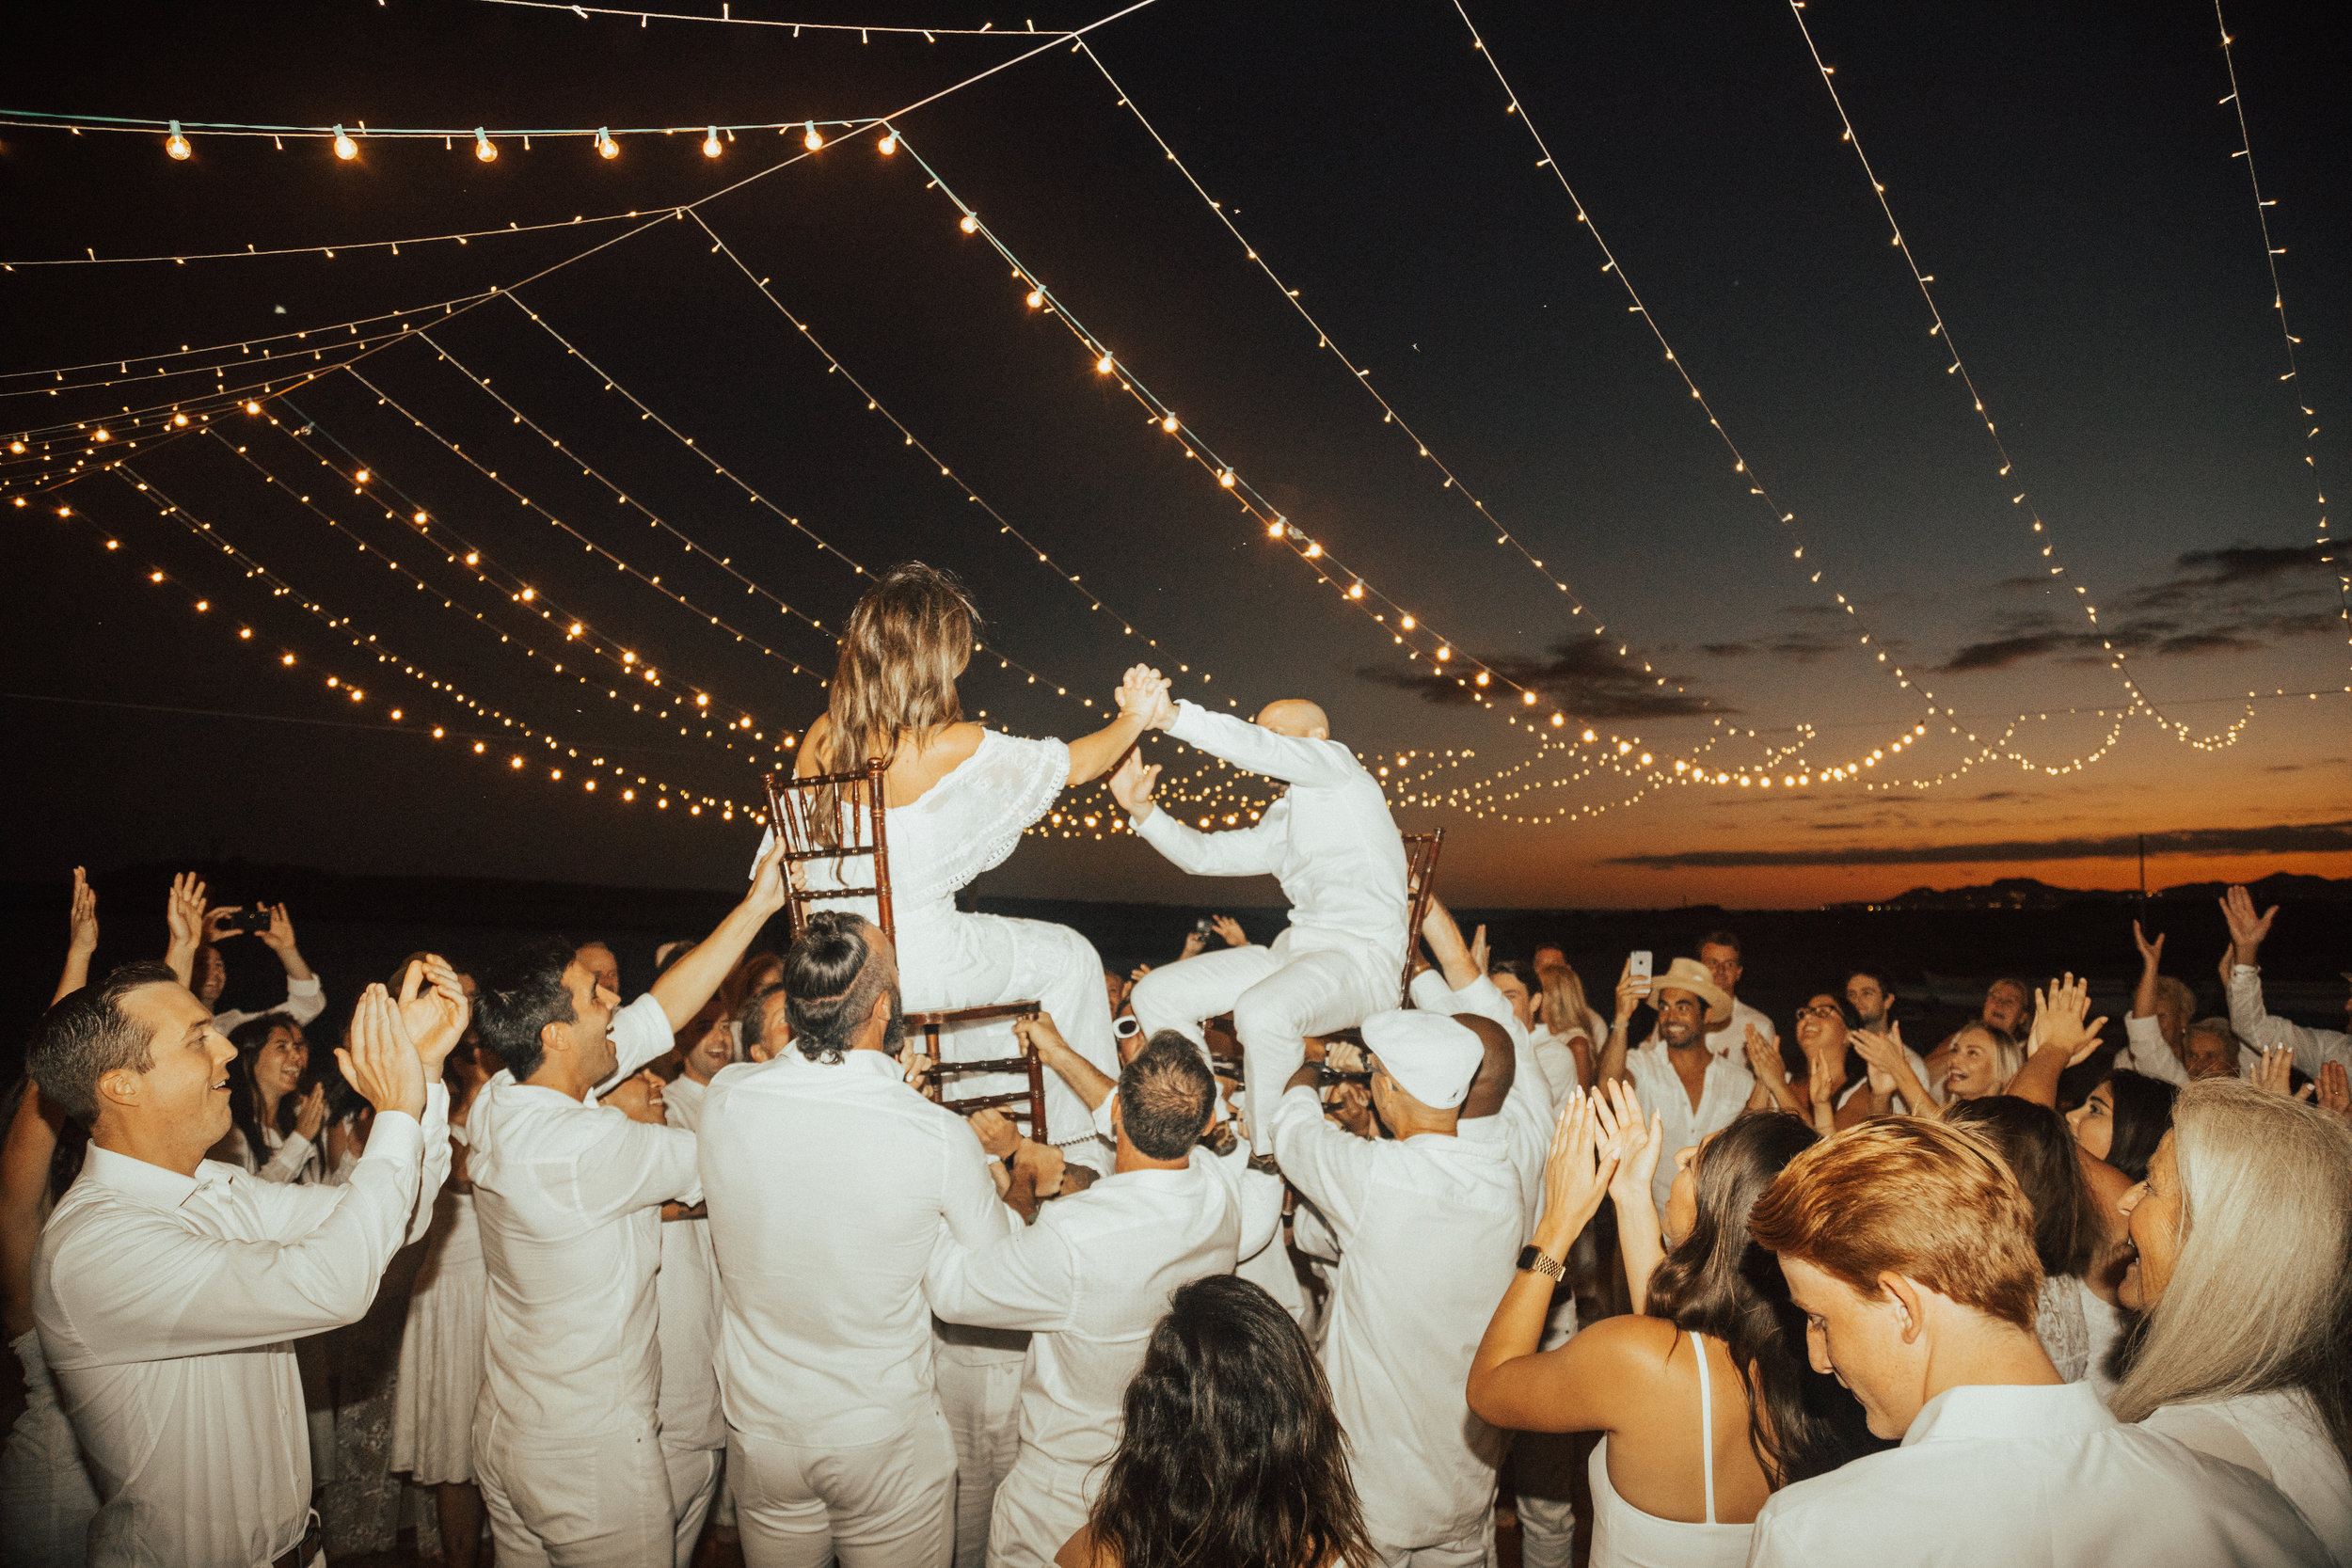 CassiePhotos-WeddingWirePhotos-32.jpg